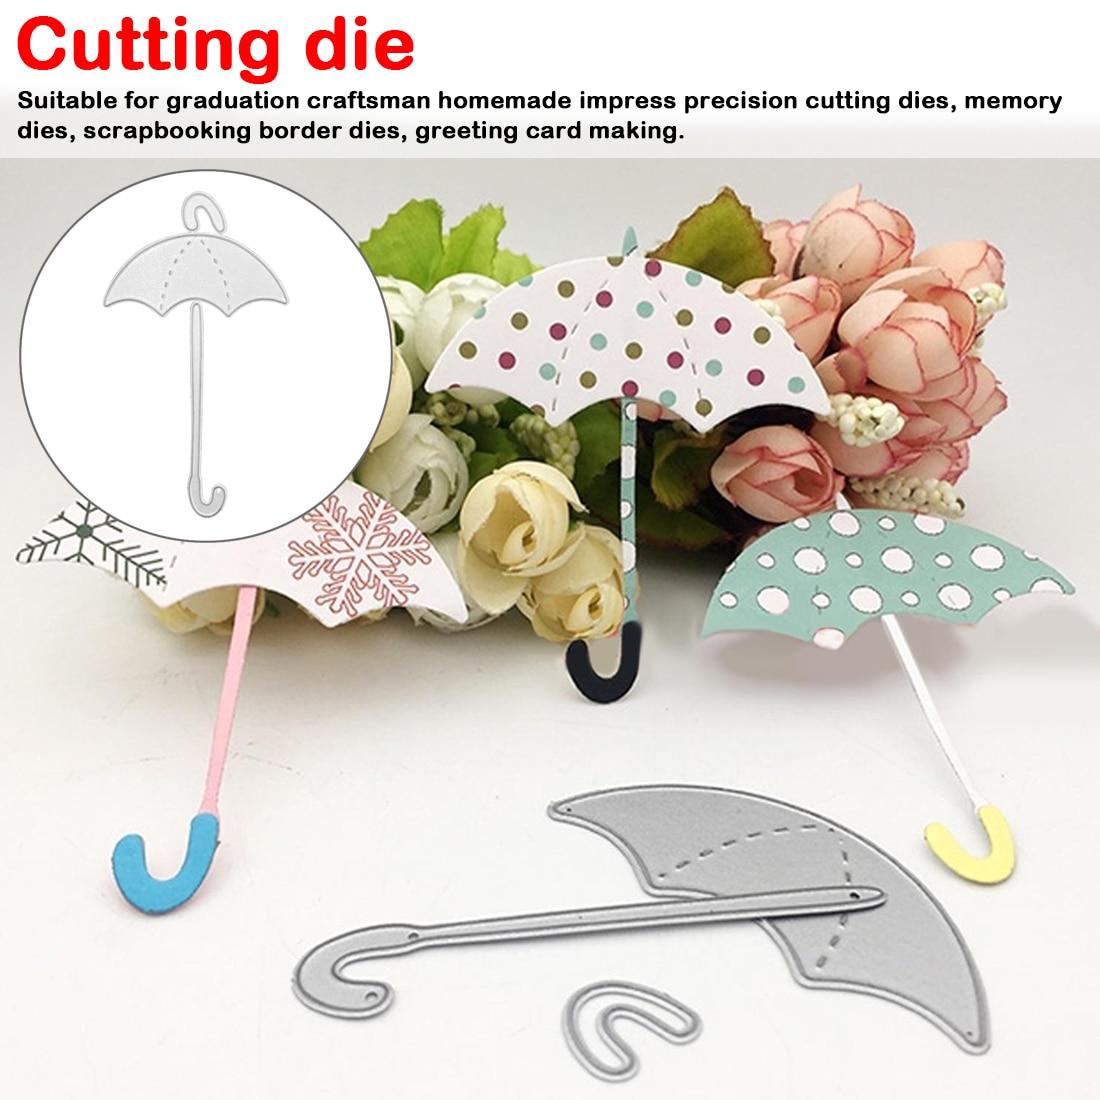 METAL CUTTING DIES Build Up Umbrella Cut Scrapbooking Mould Die Cut Stencils DIY